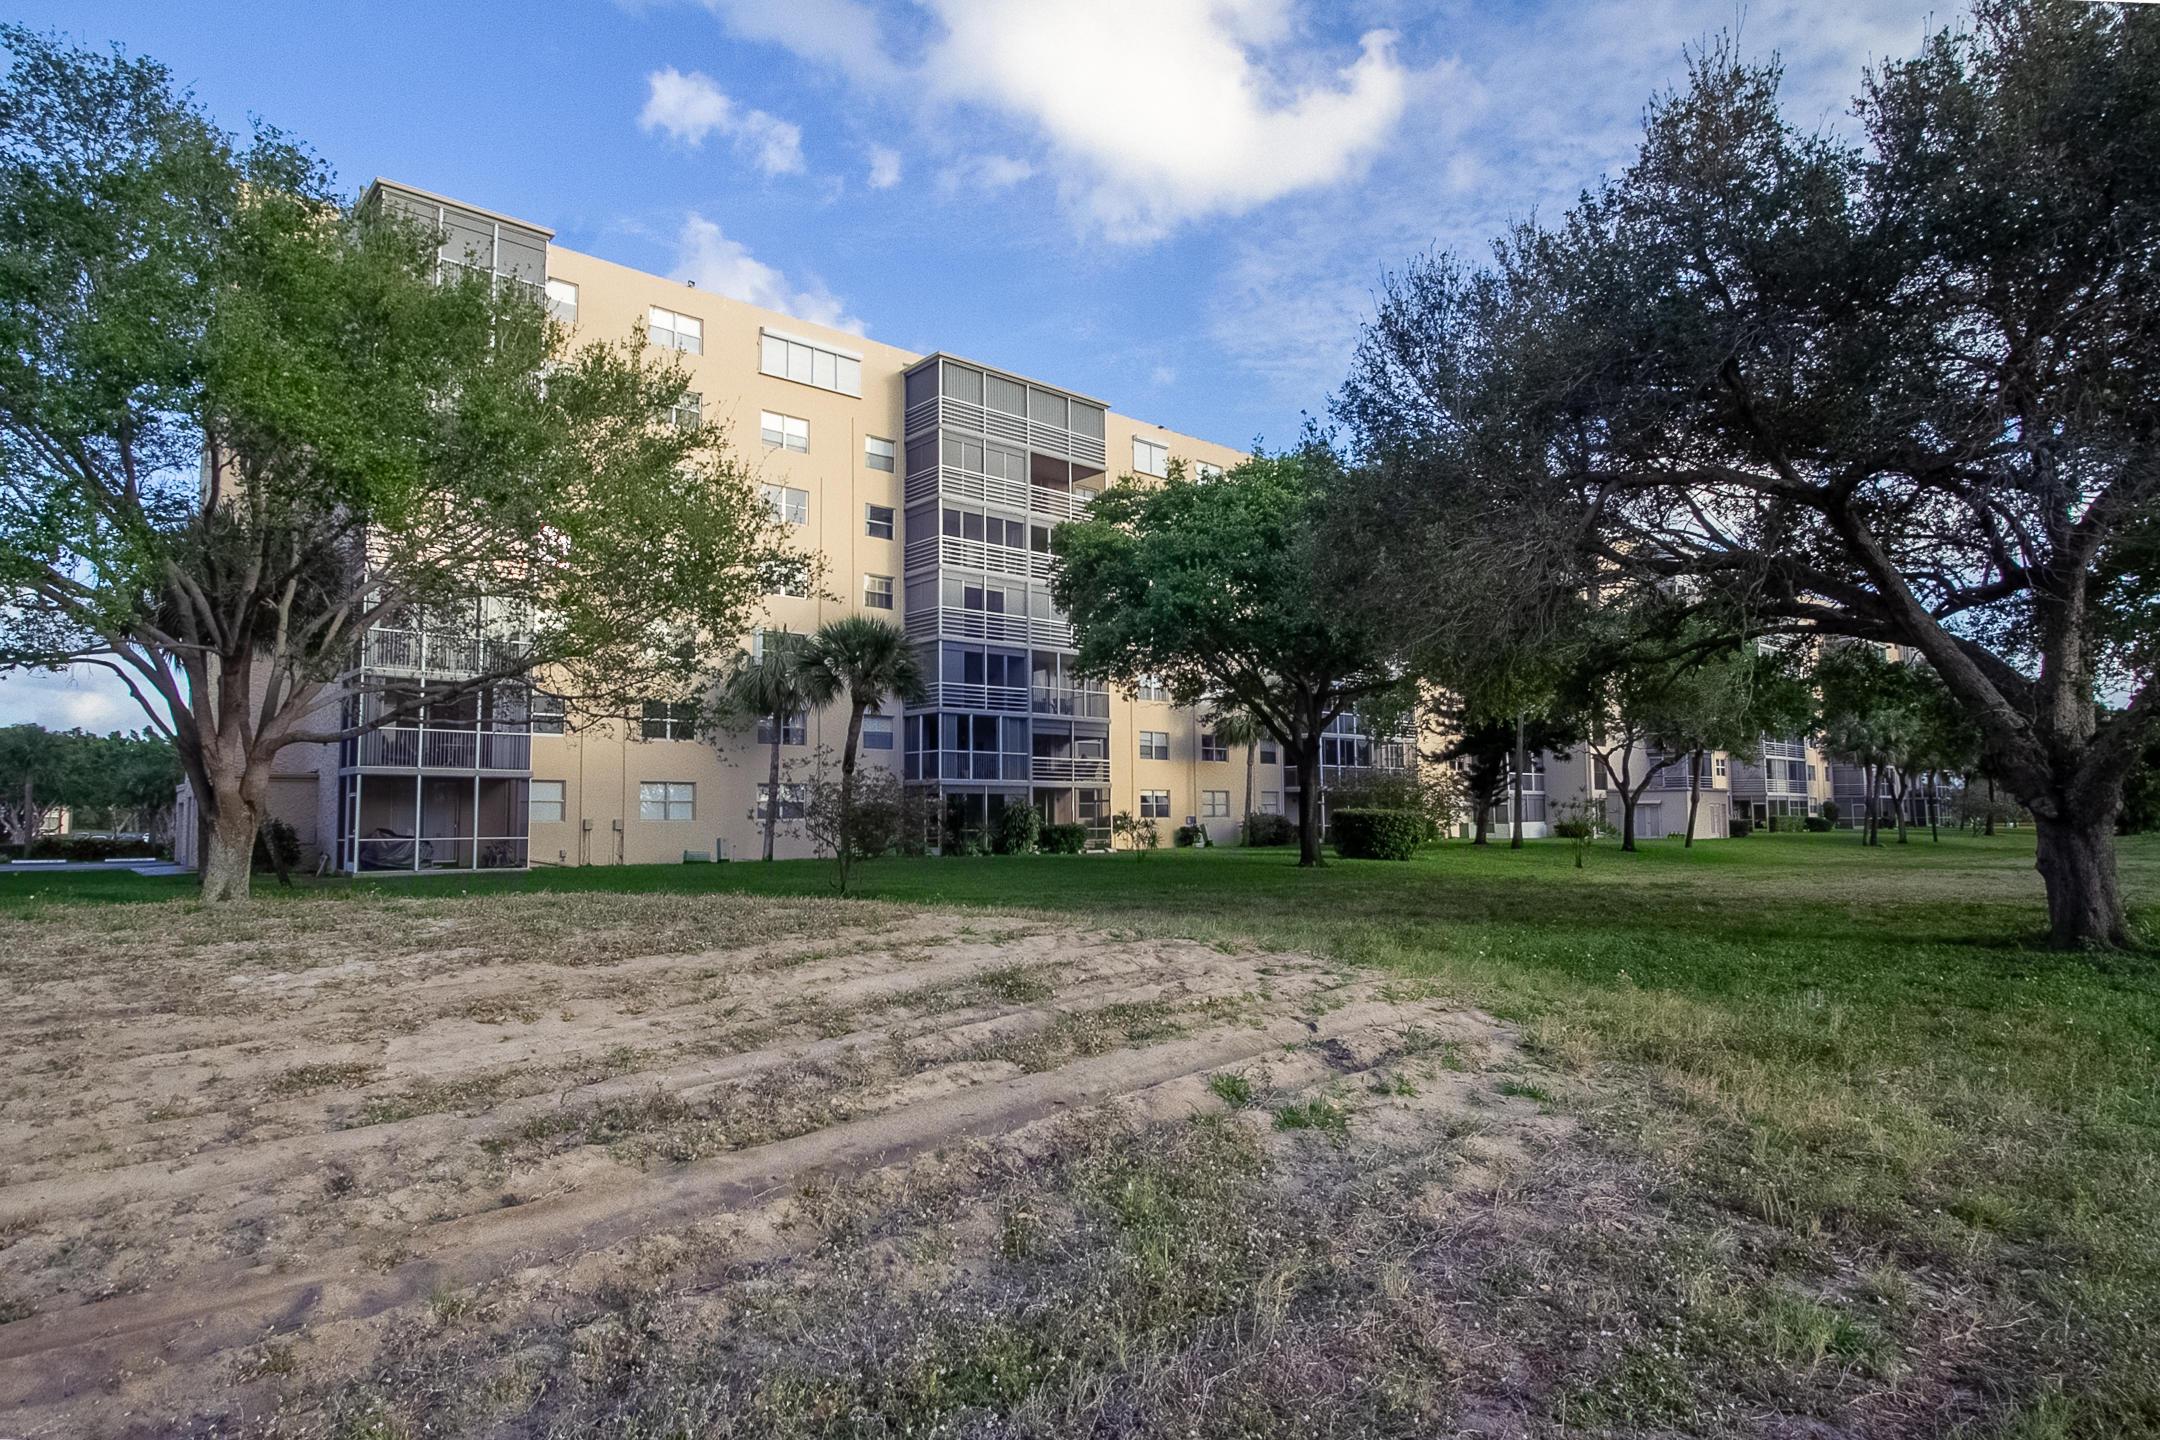 5961 2nd Avenue, Boca Raton, Florida 33431, 2 Bedrooms Bedrooms, ,2 BathroomsBathrooms,Rental,For Rent,2nd,RX-10608815